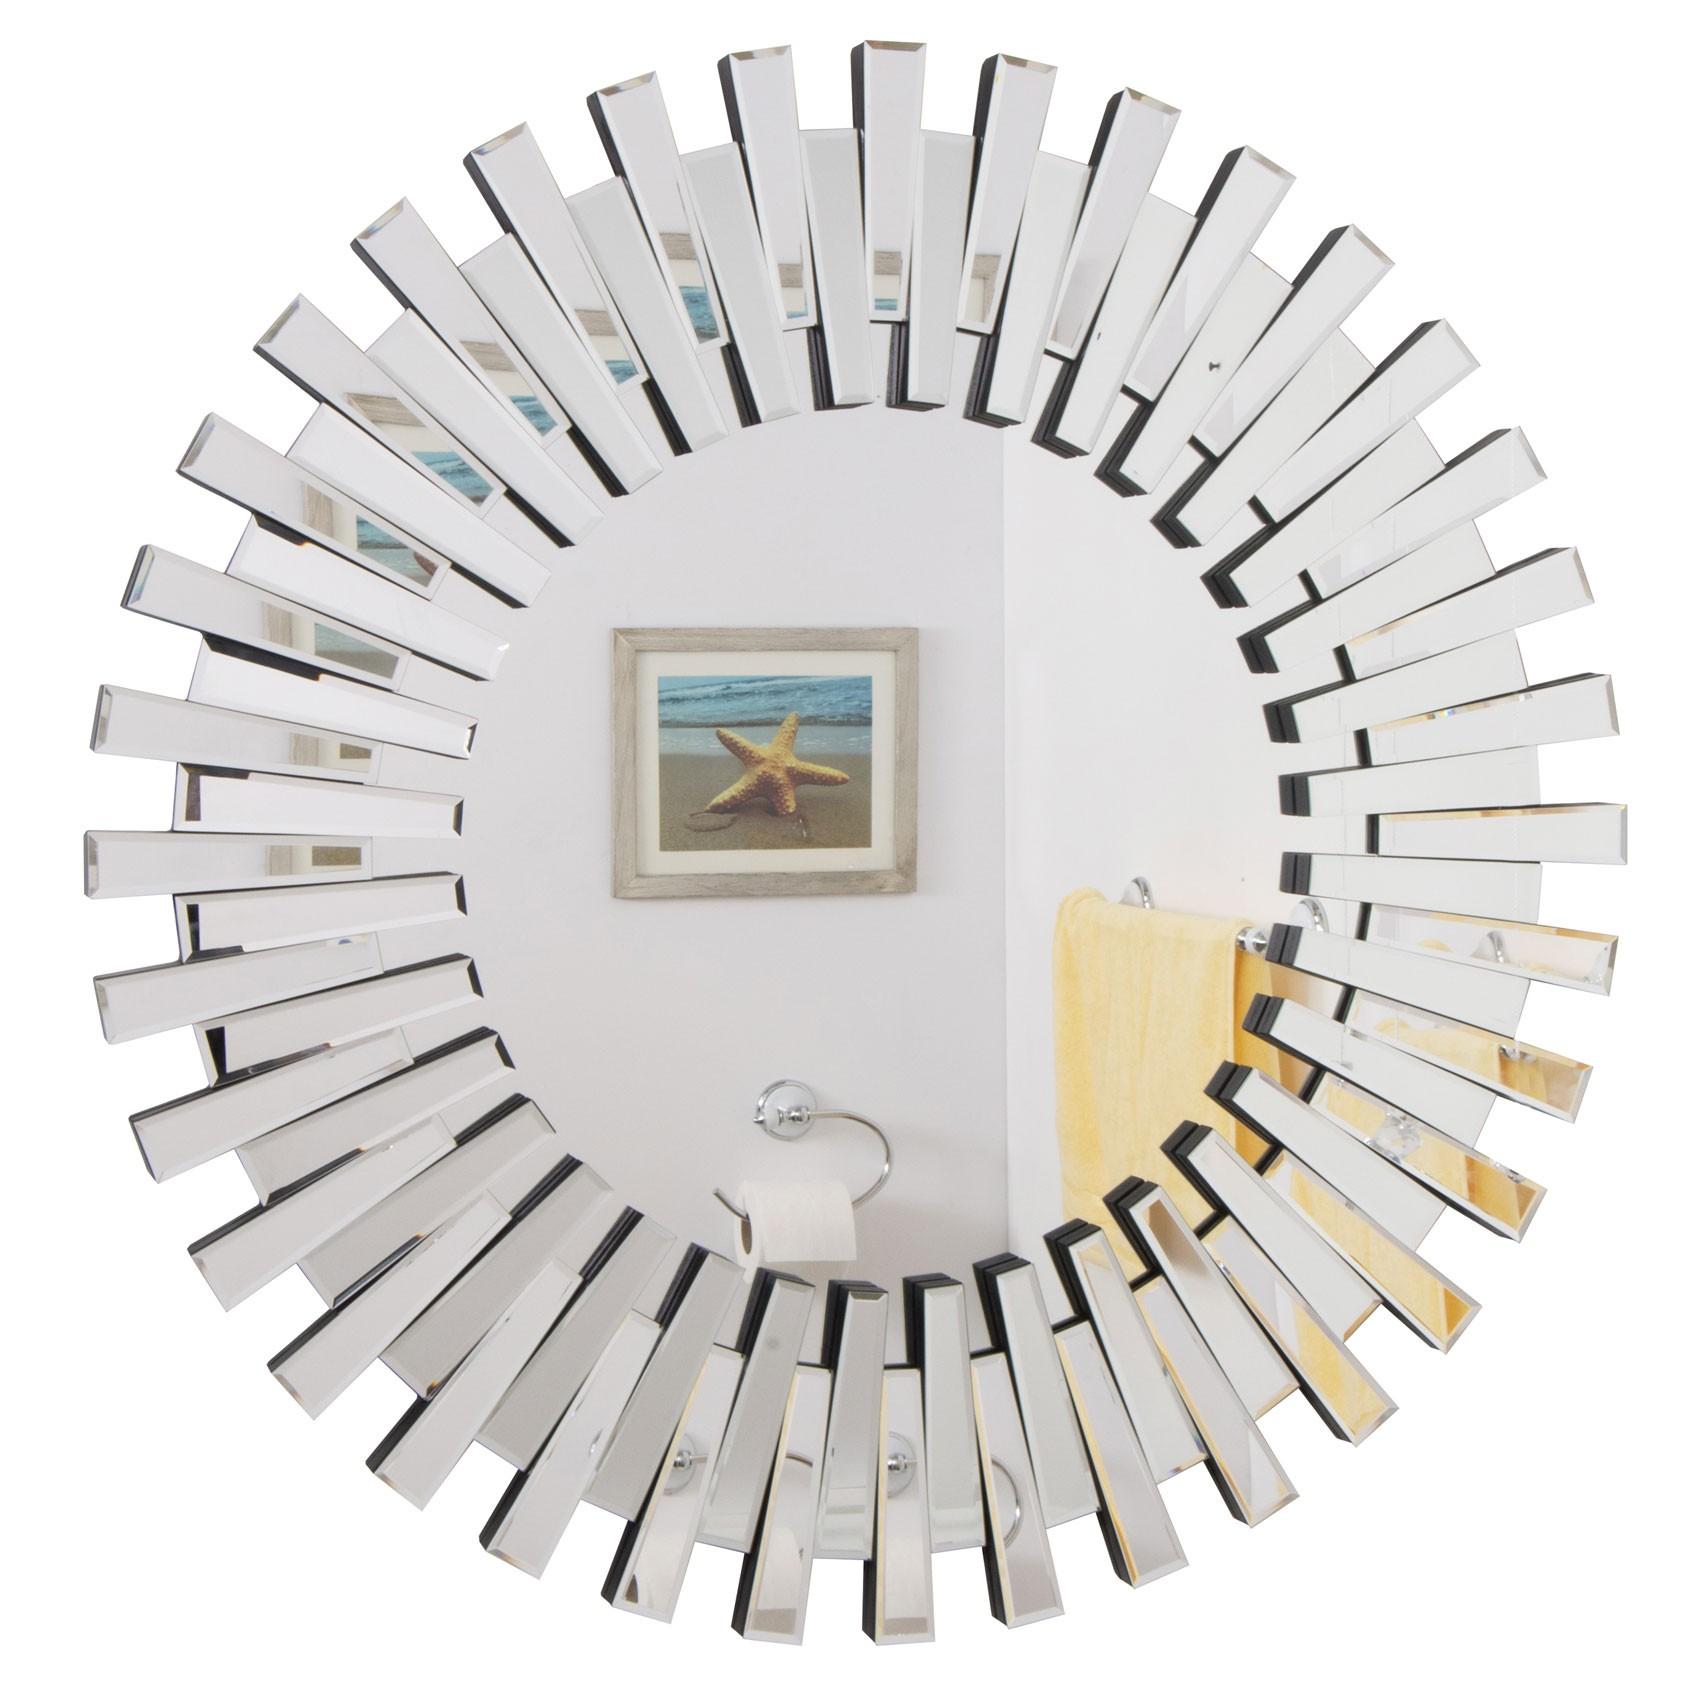 Starburst mirror uk buying cialis online without uk circular art item specifics amipublicfo Choice Image